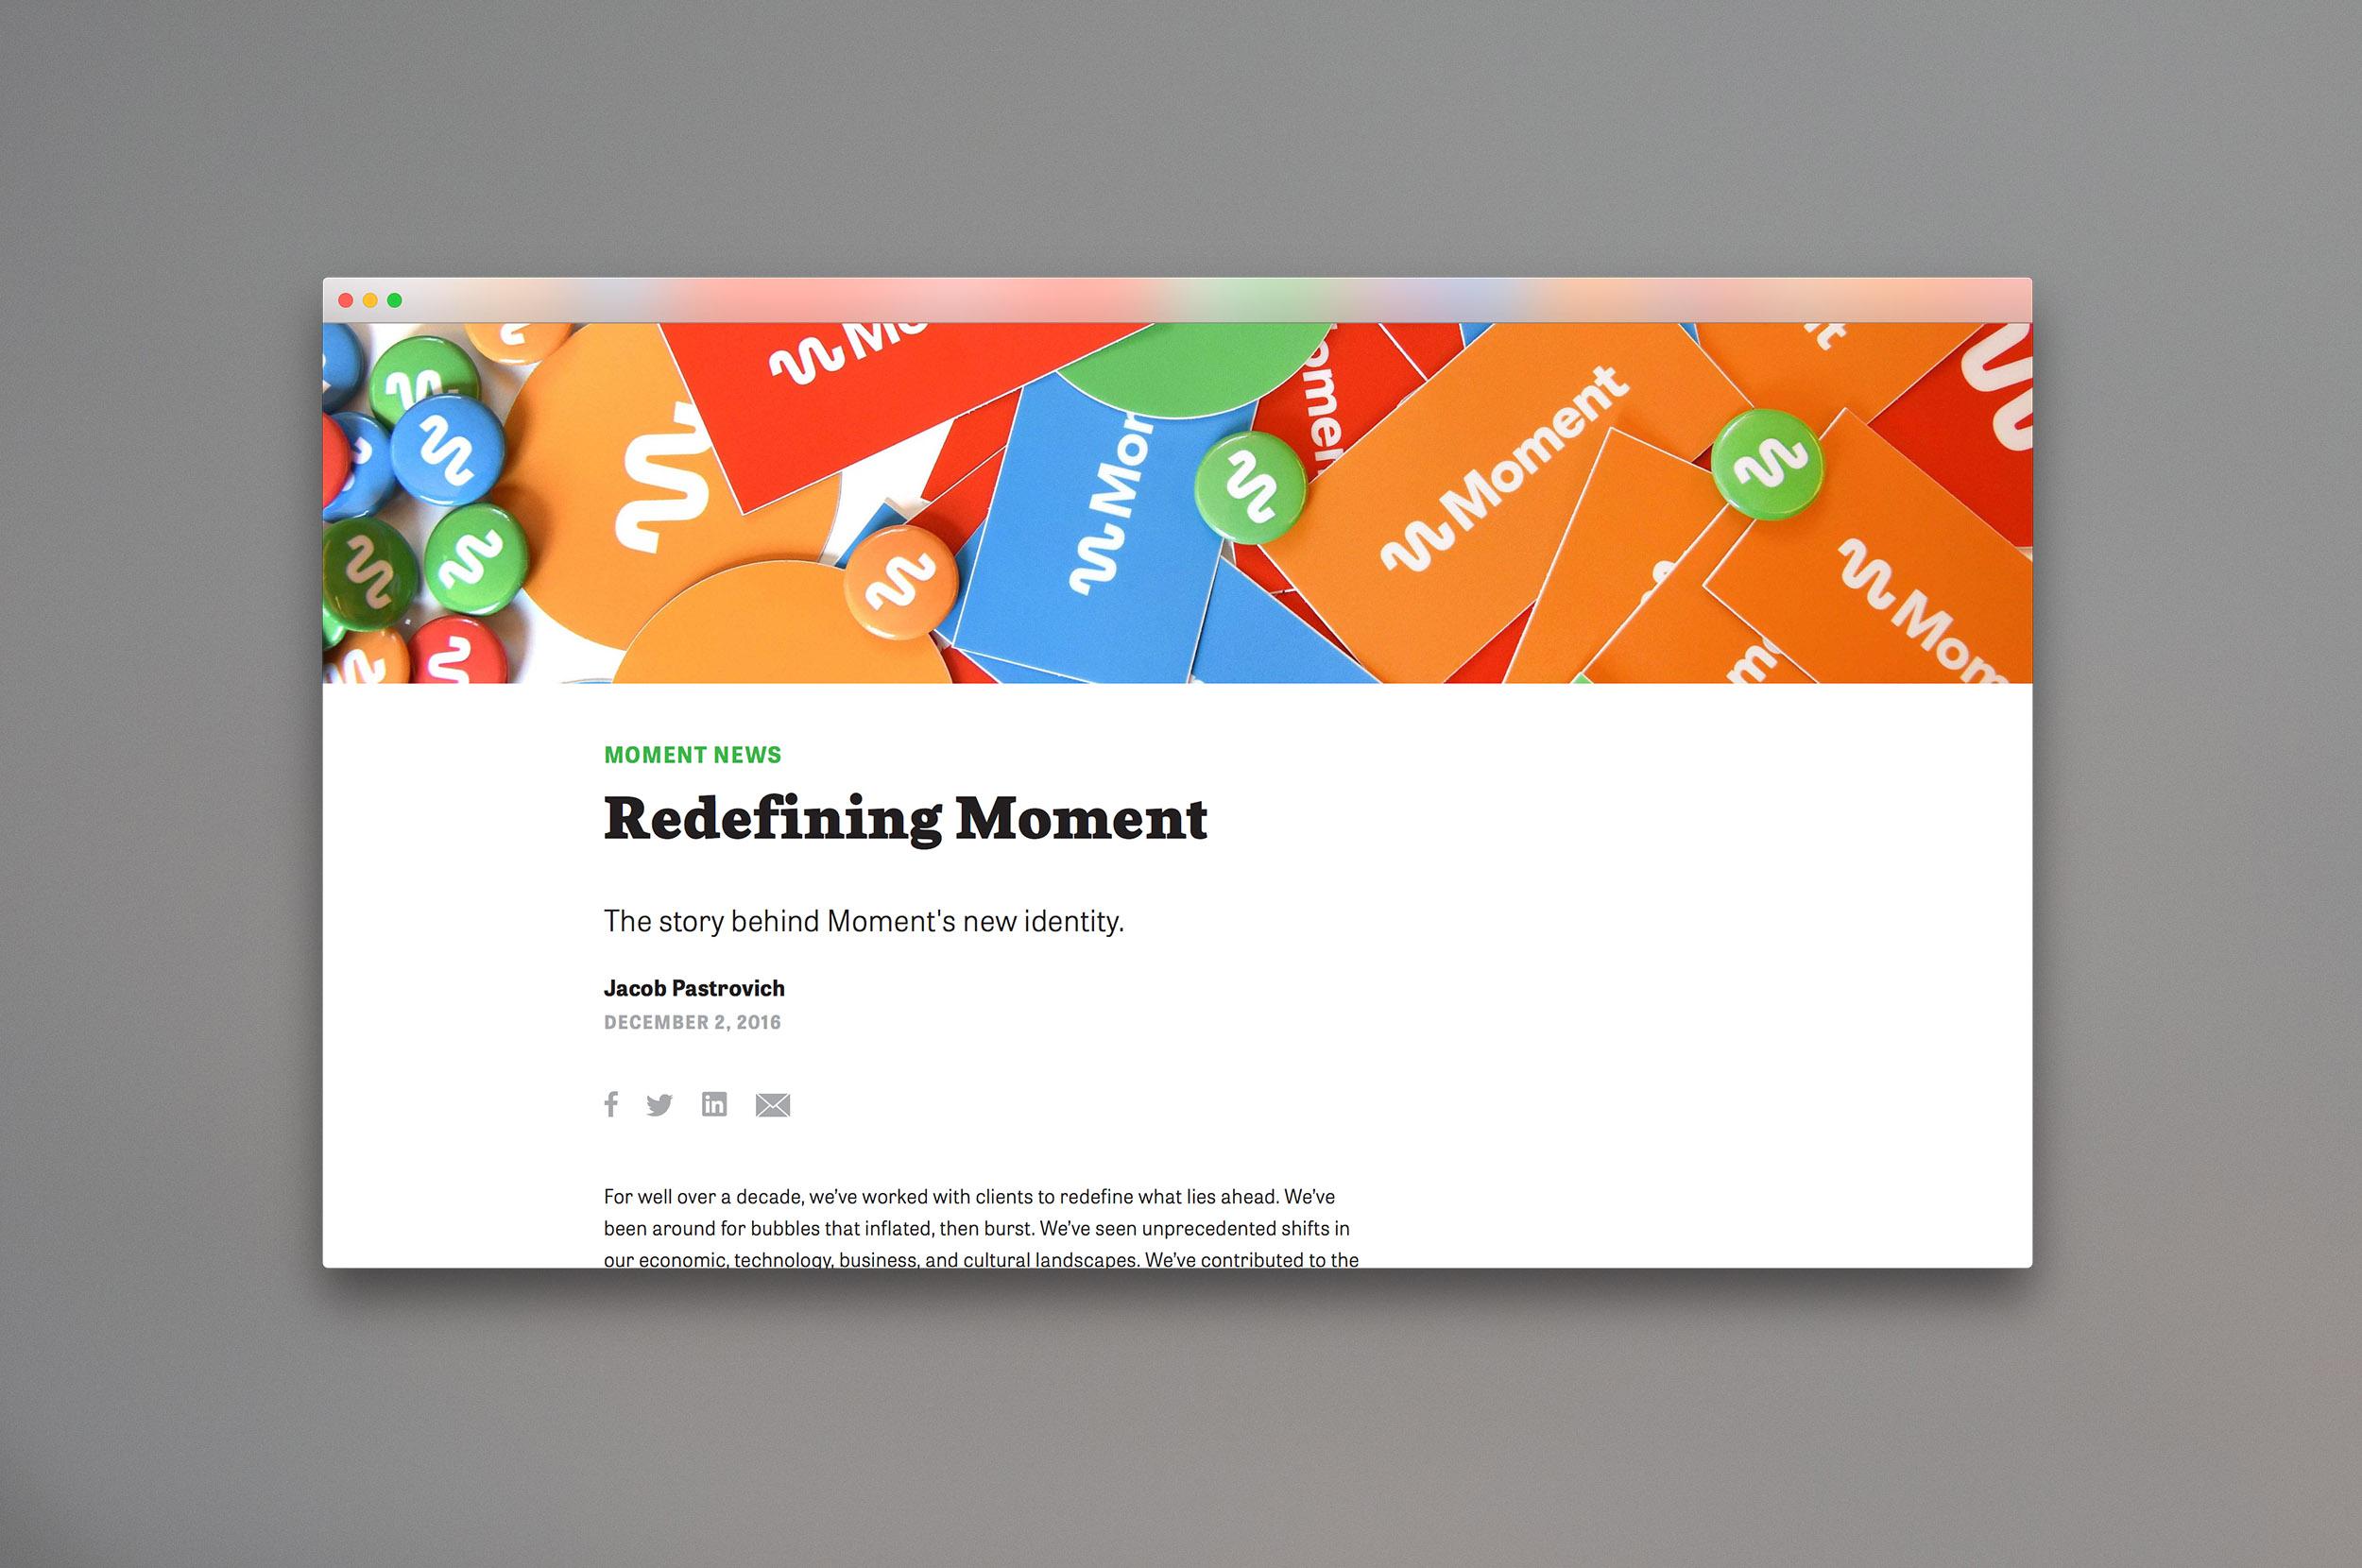 repositioning-moment-8.jpg